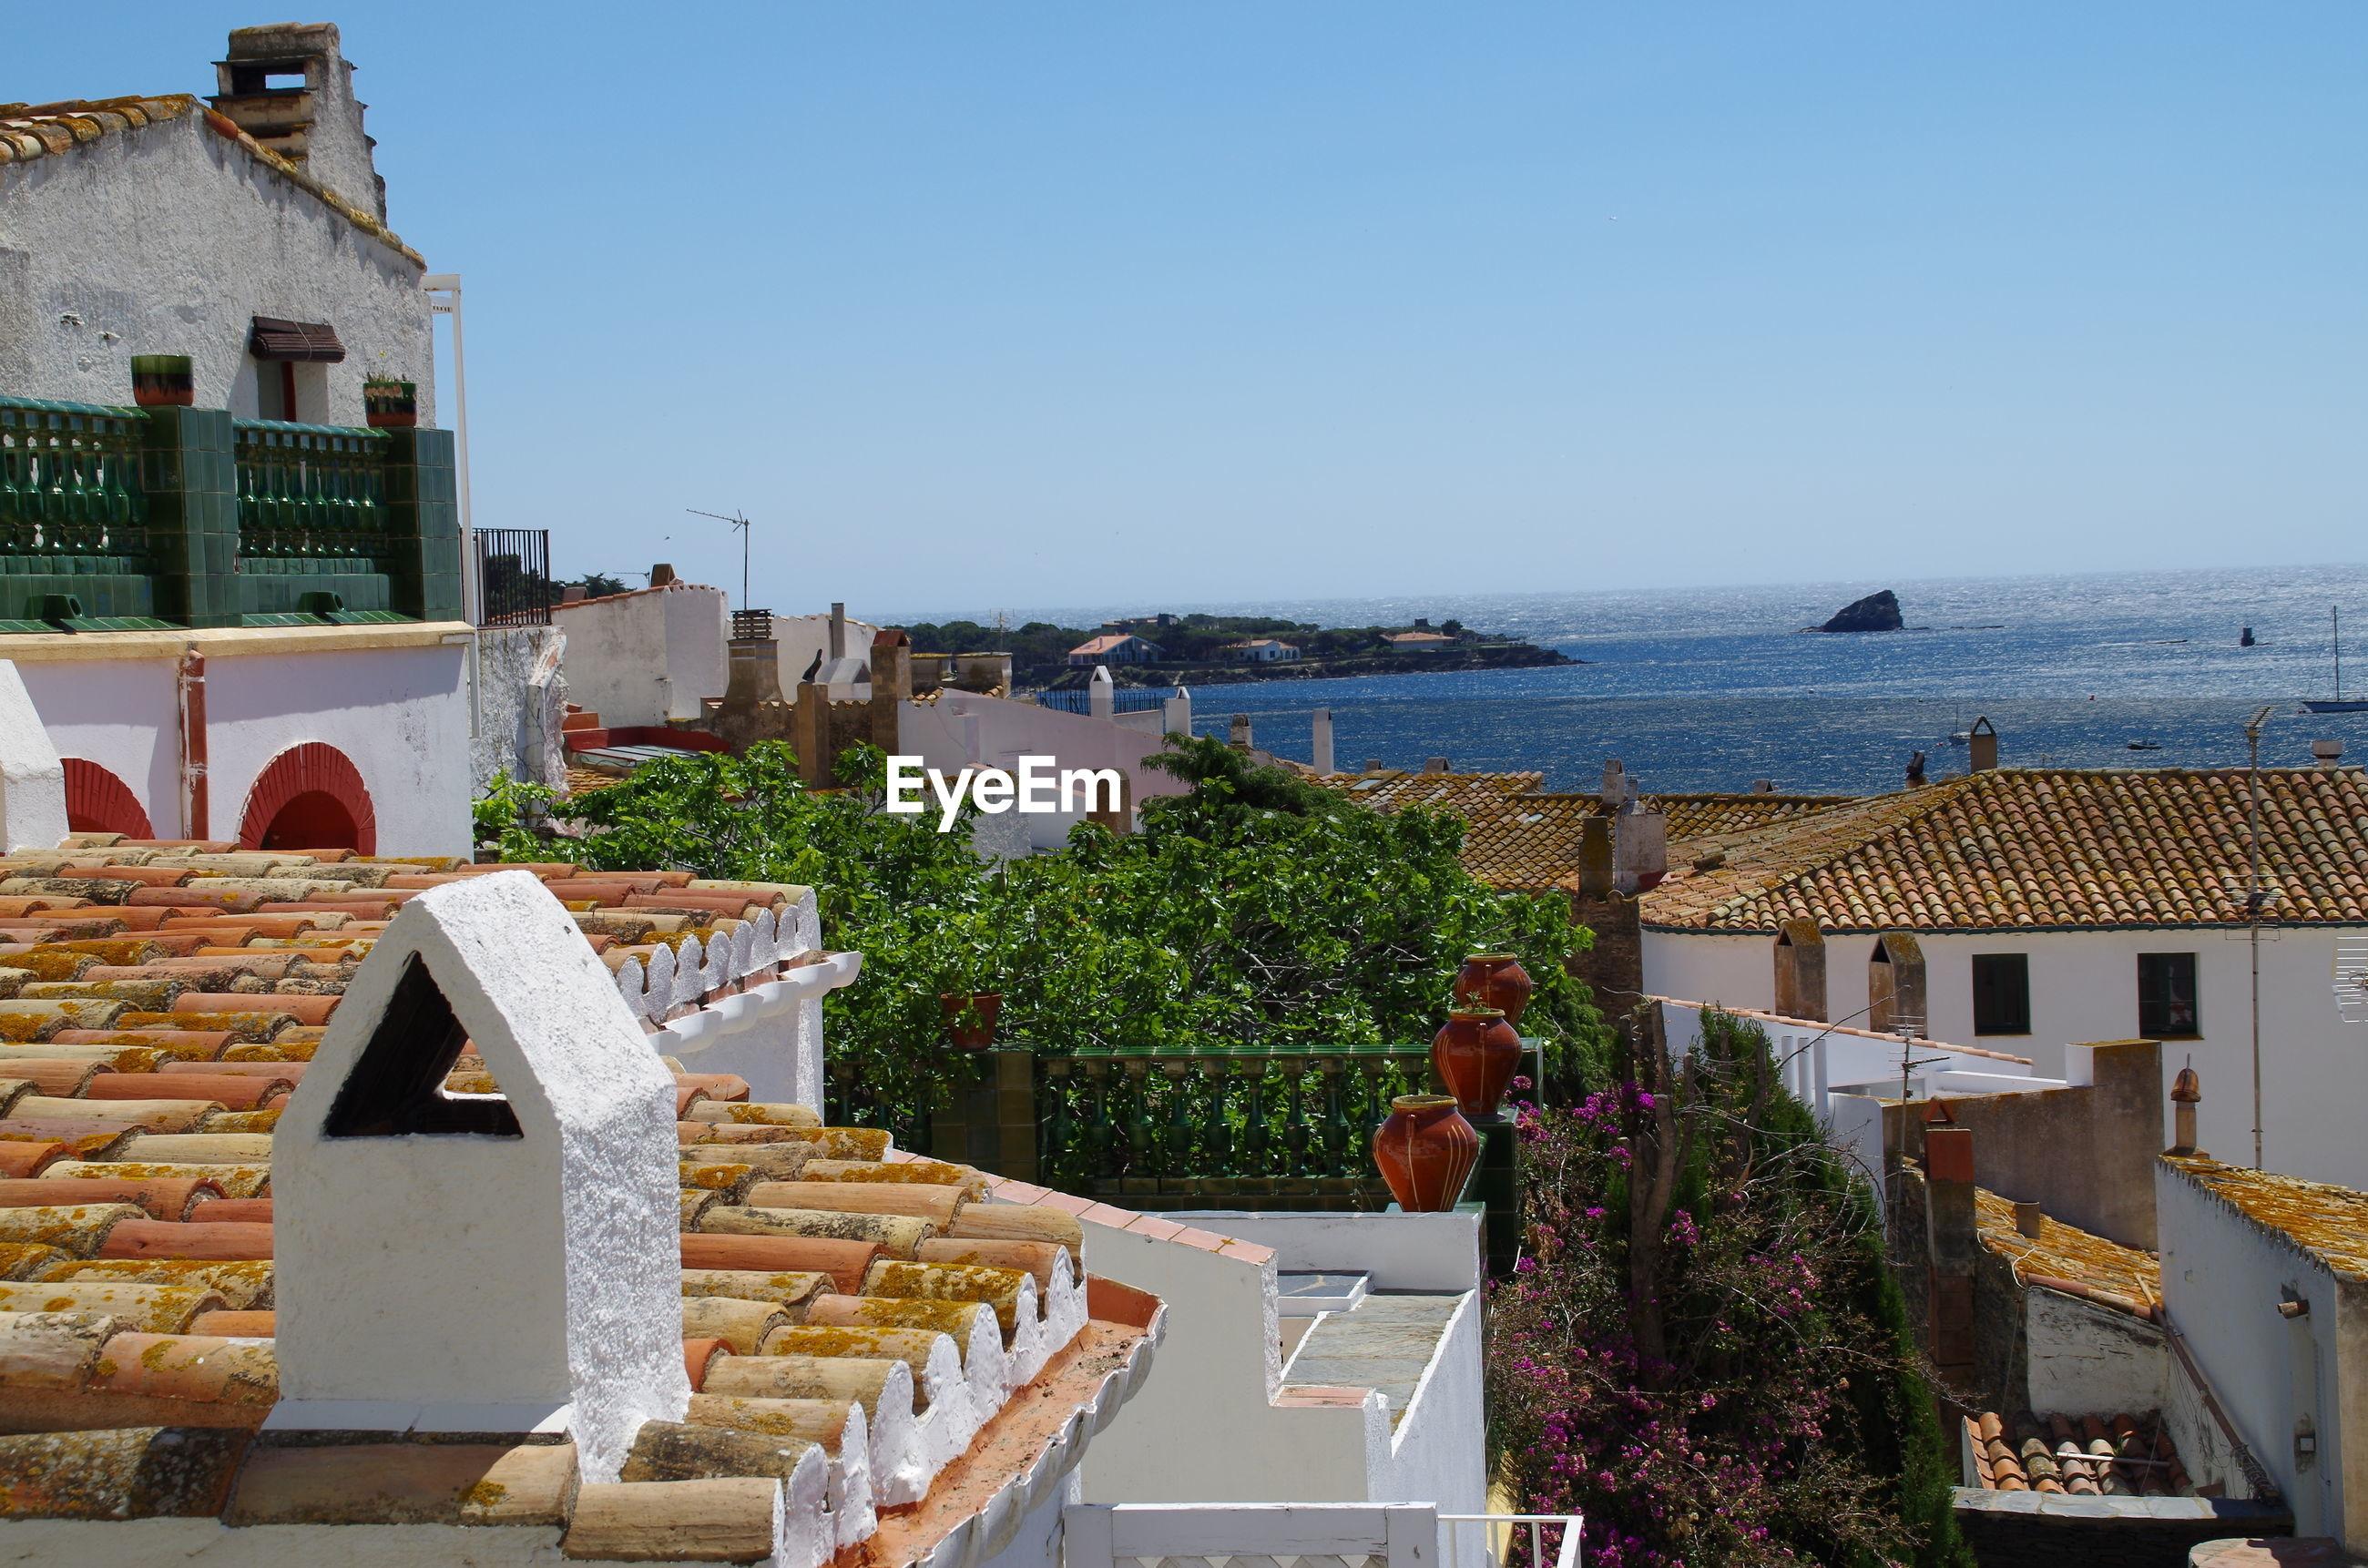 BUILDINGS BY SEA AGAINST CLEAR SKY